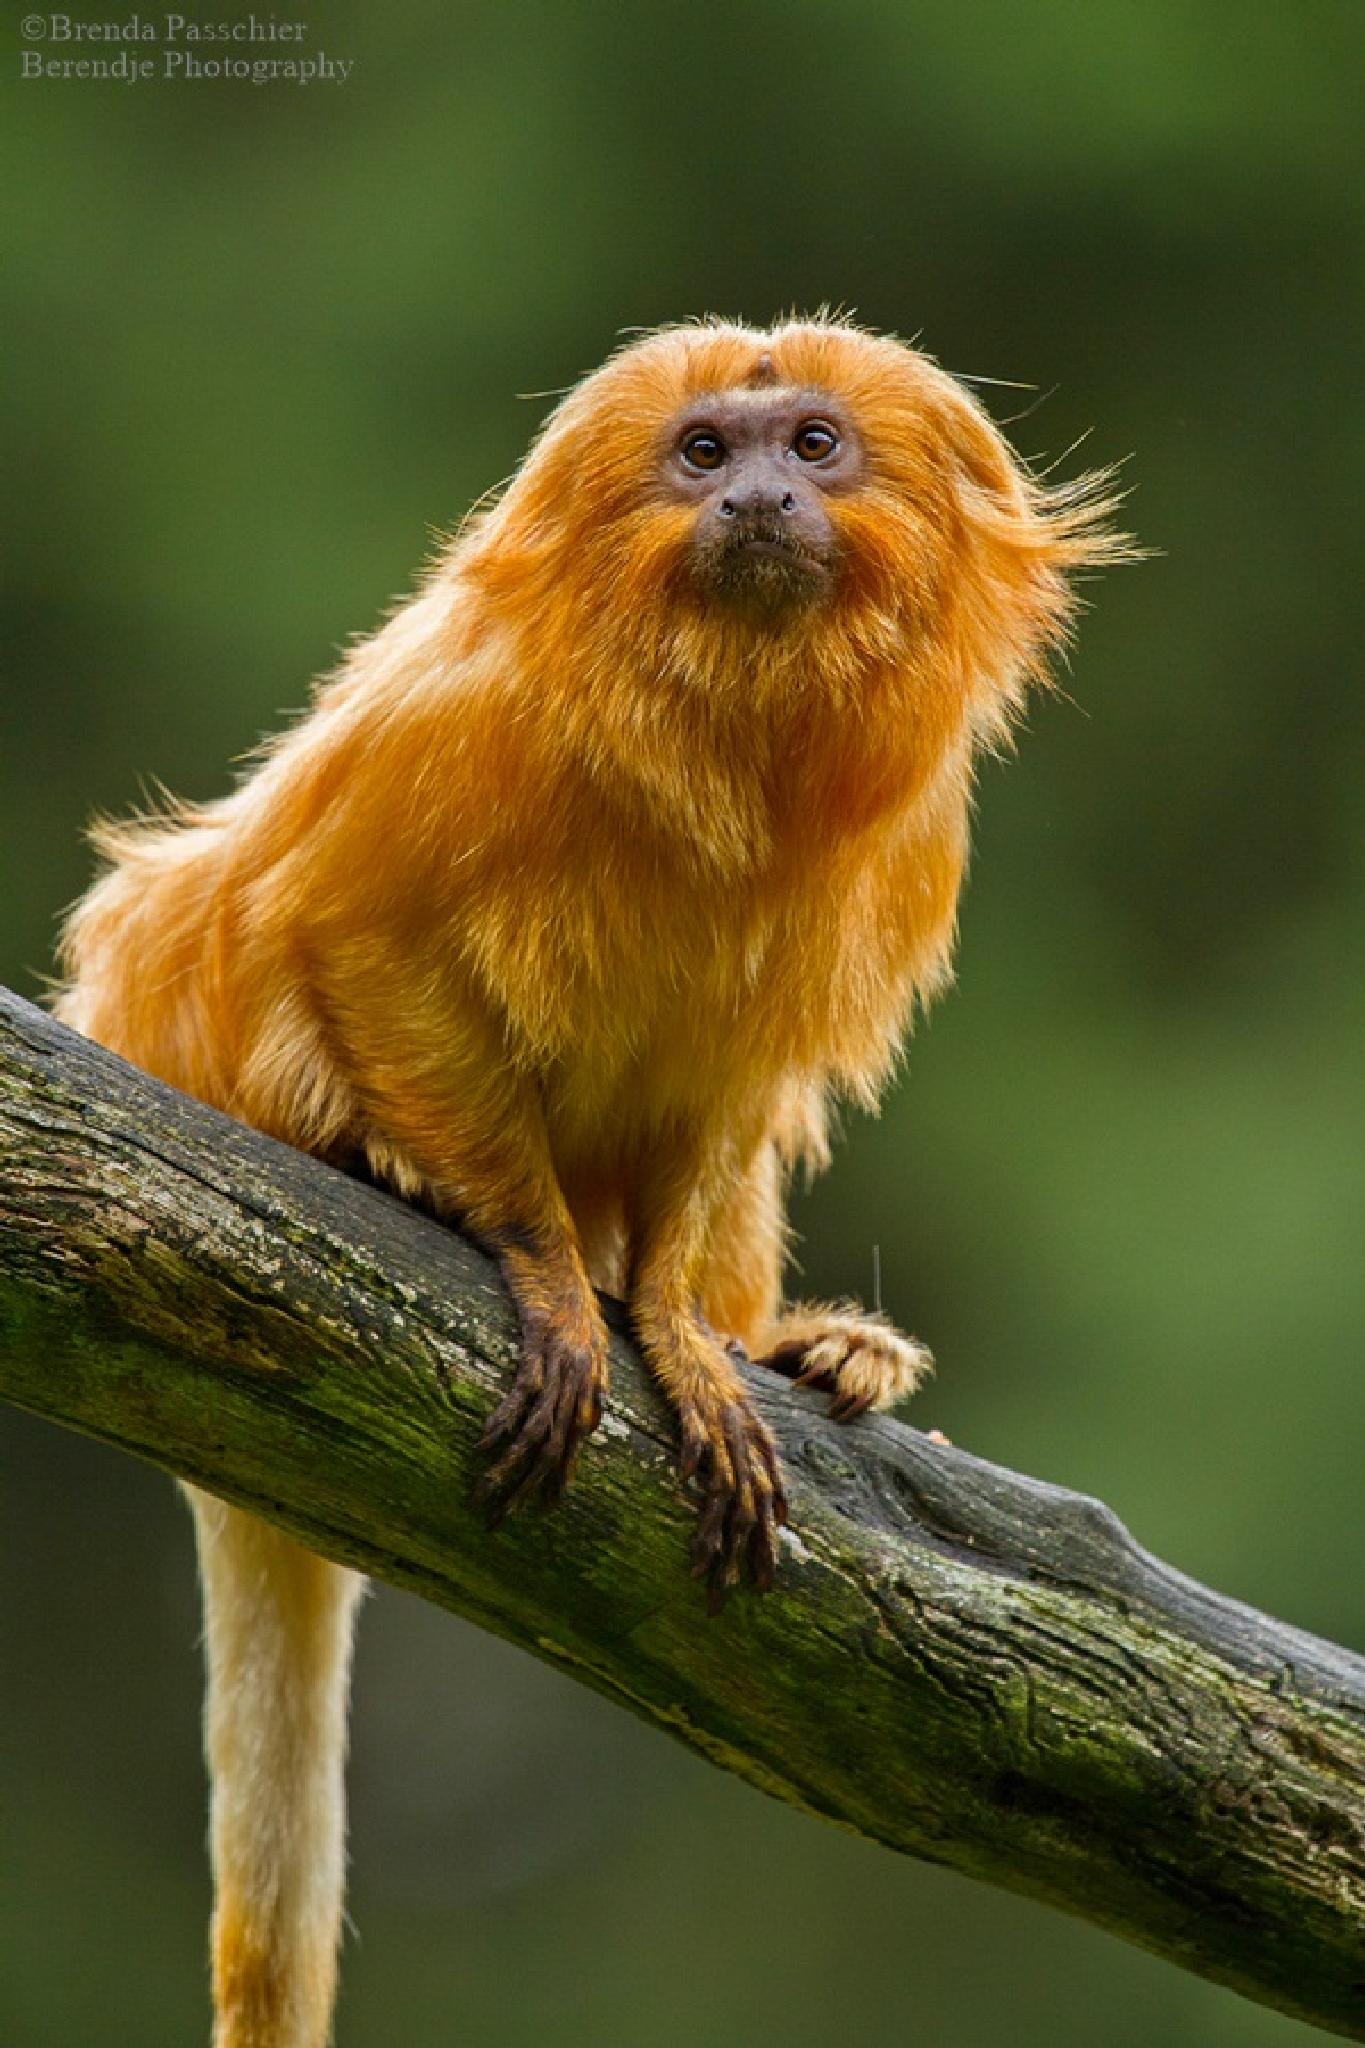 Golden lion tamarin by Brenda Passchier